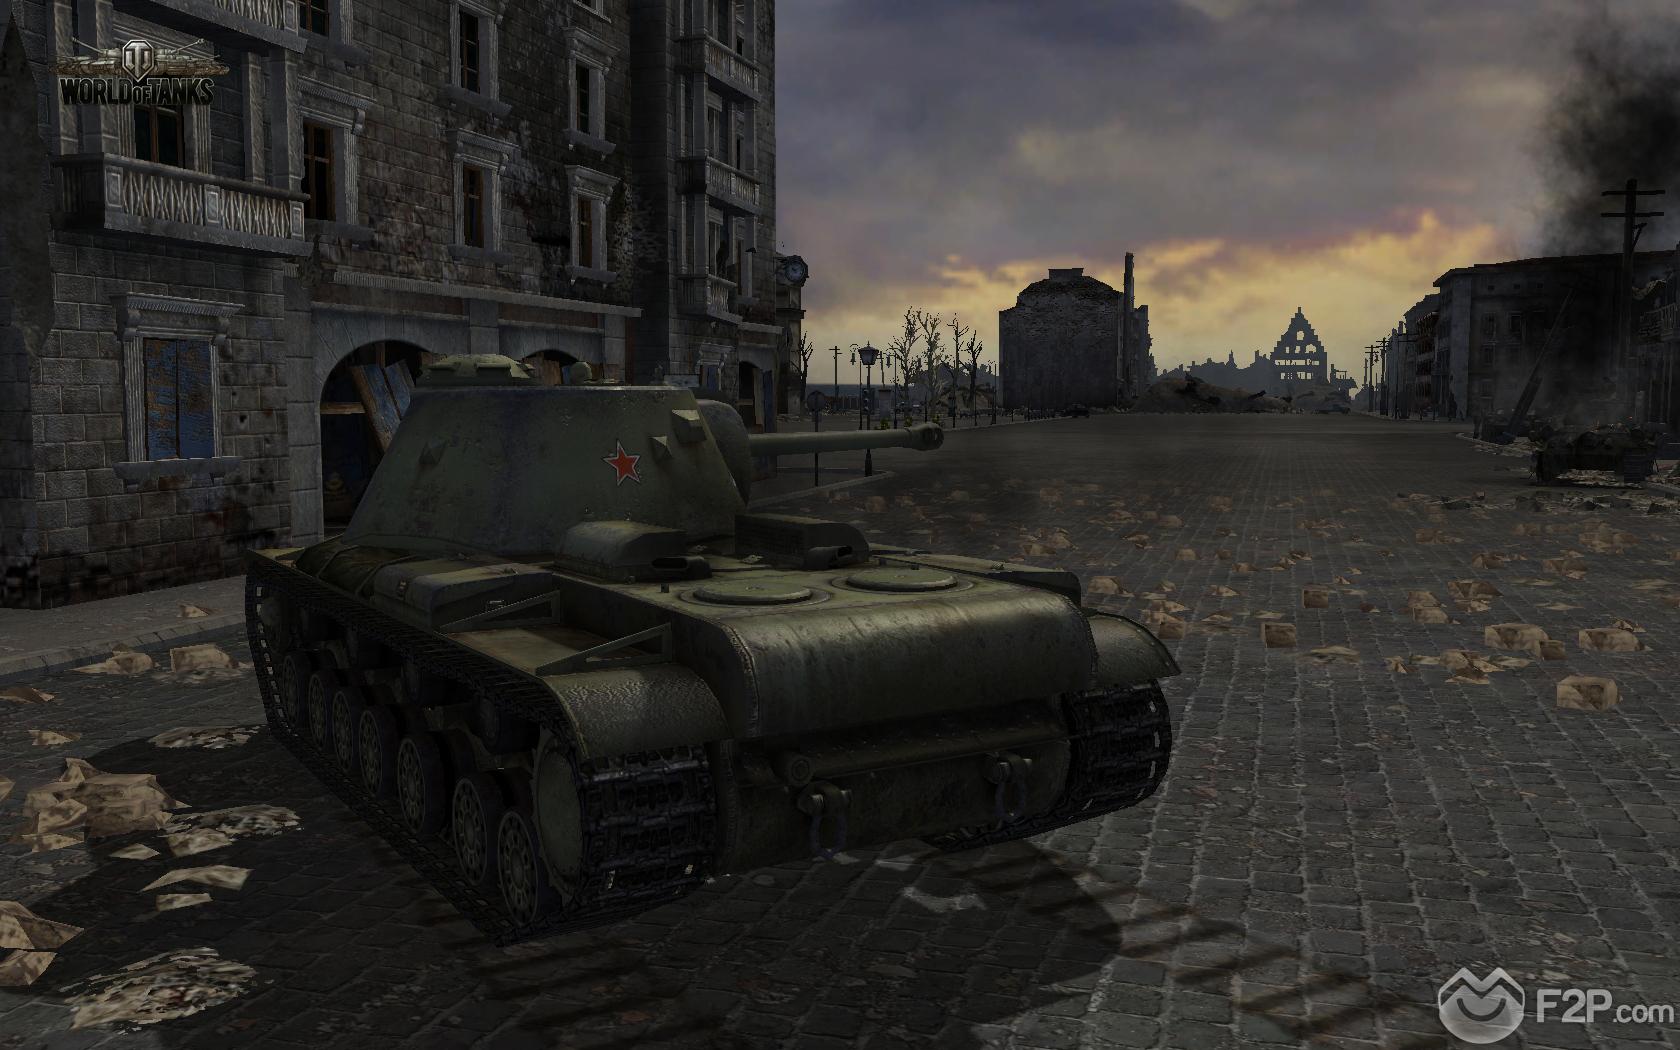 Click image for larger version.Name:World of Tanks 60.jpgViews:138Size:1.11 MBID:3839